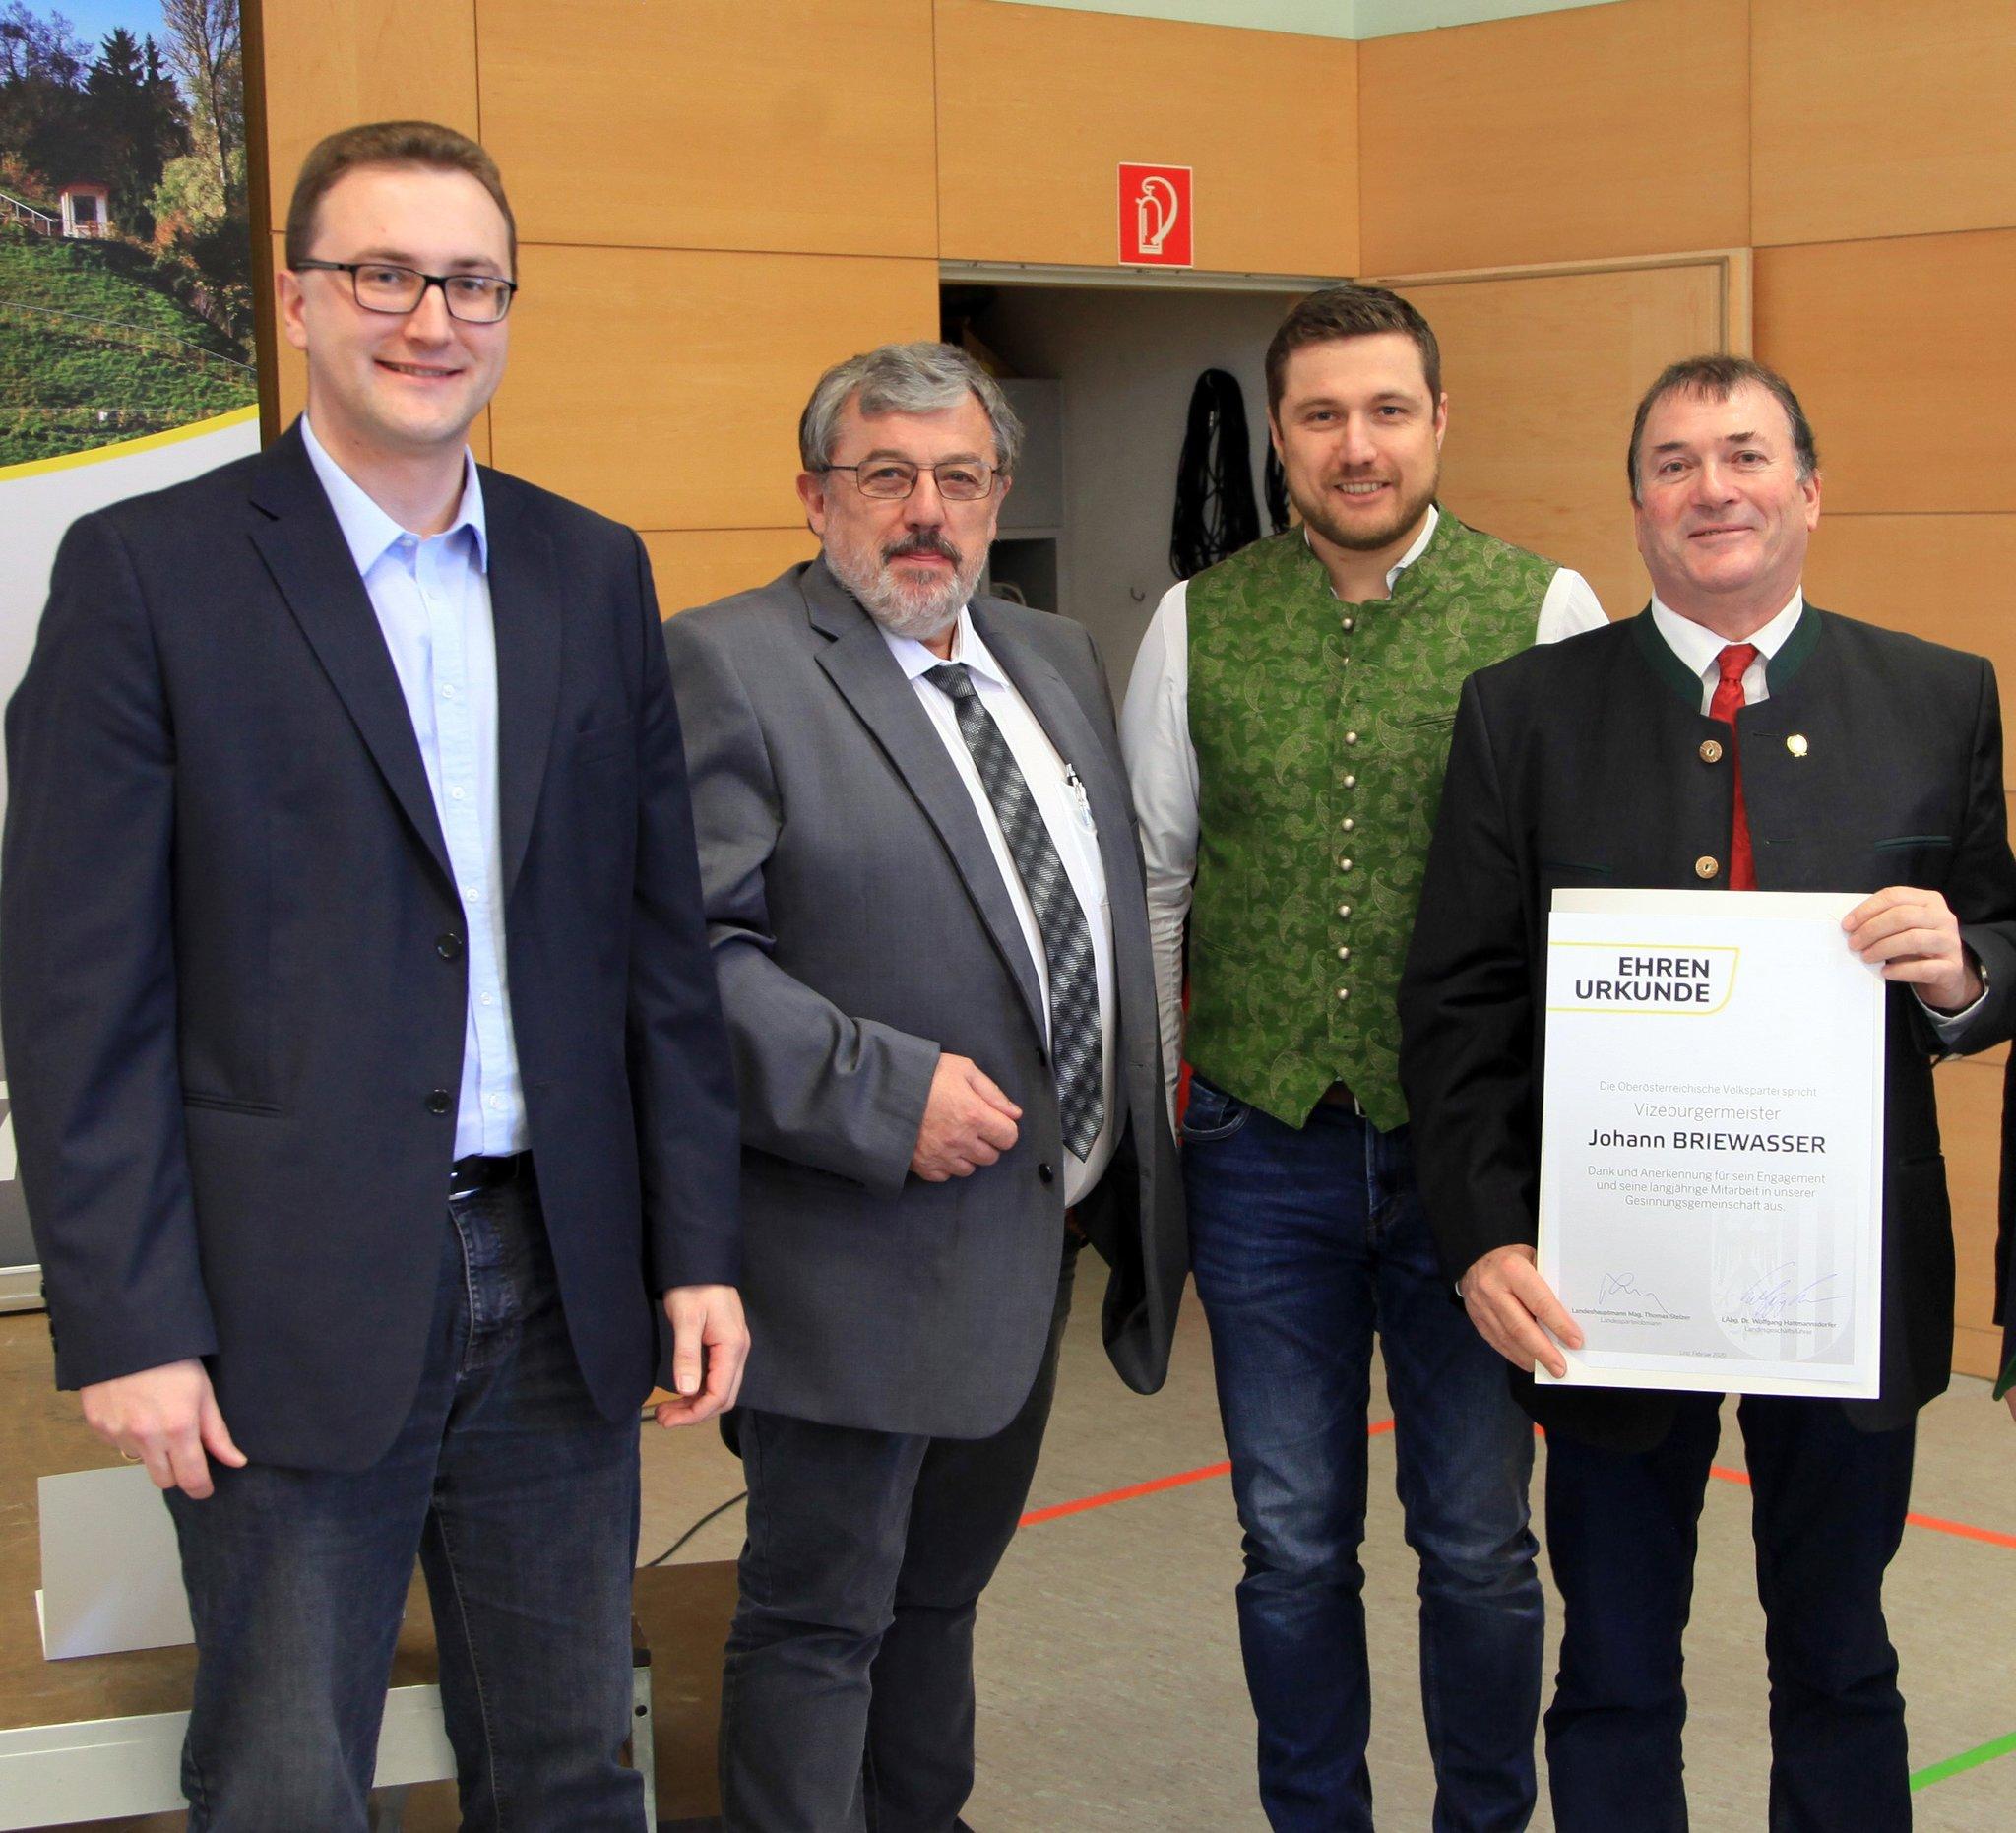 Josefimarkt 2020 - Helpfau-Uttendorf - RiS-Kommunal - Home